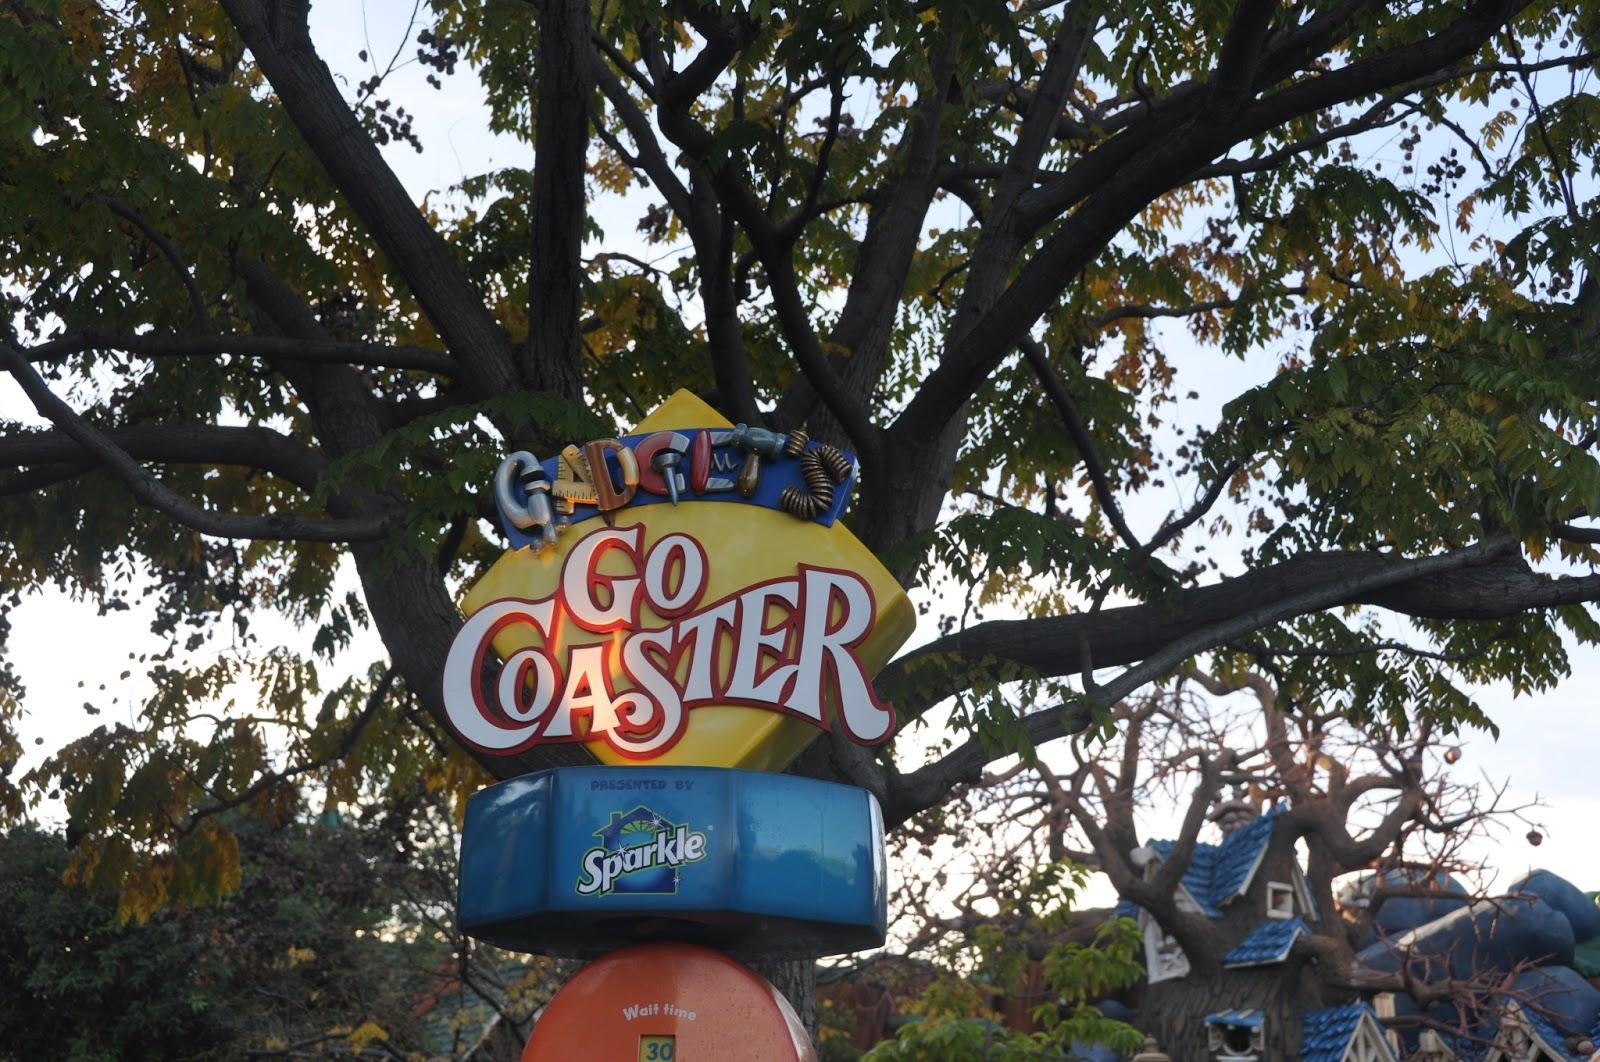 Disney, Disneyland, Disney fan, Disney lover, magical kingdom, what to do at Disneyland, Disney fashion, Disney apparel, Disney food, Disney food review, mickey mouse ears, where to eat at Disneyland, fashion blog, fashion blogger, style blog, style blogger, mens fashion, mens fashion blog, mens style, mens style blog, womens style blog, anthropologie ootd blog, anthropologie ootd, anthropologie, ootd, mens ootd, womens ootd,